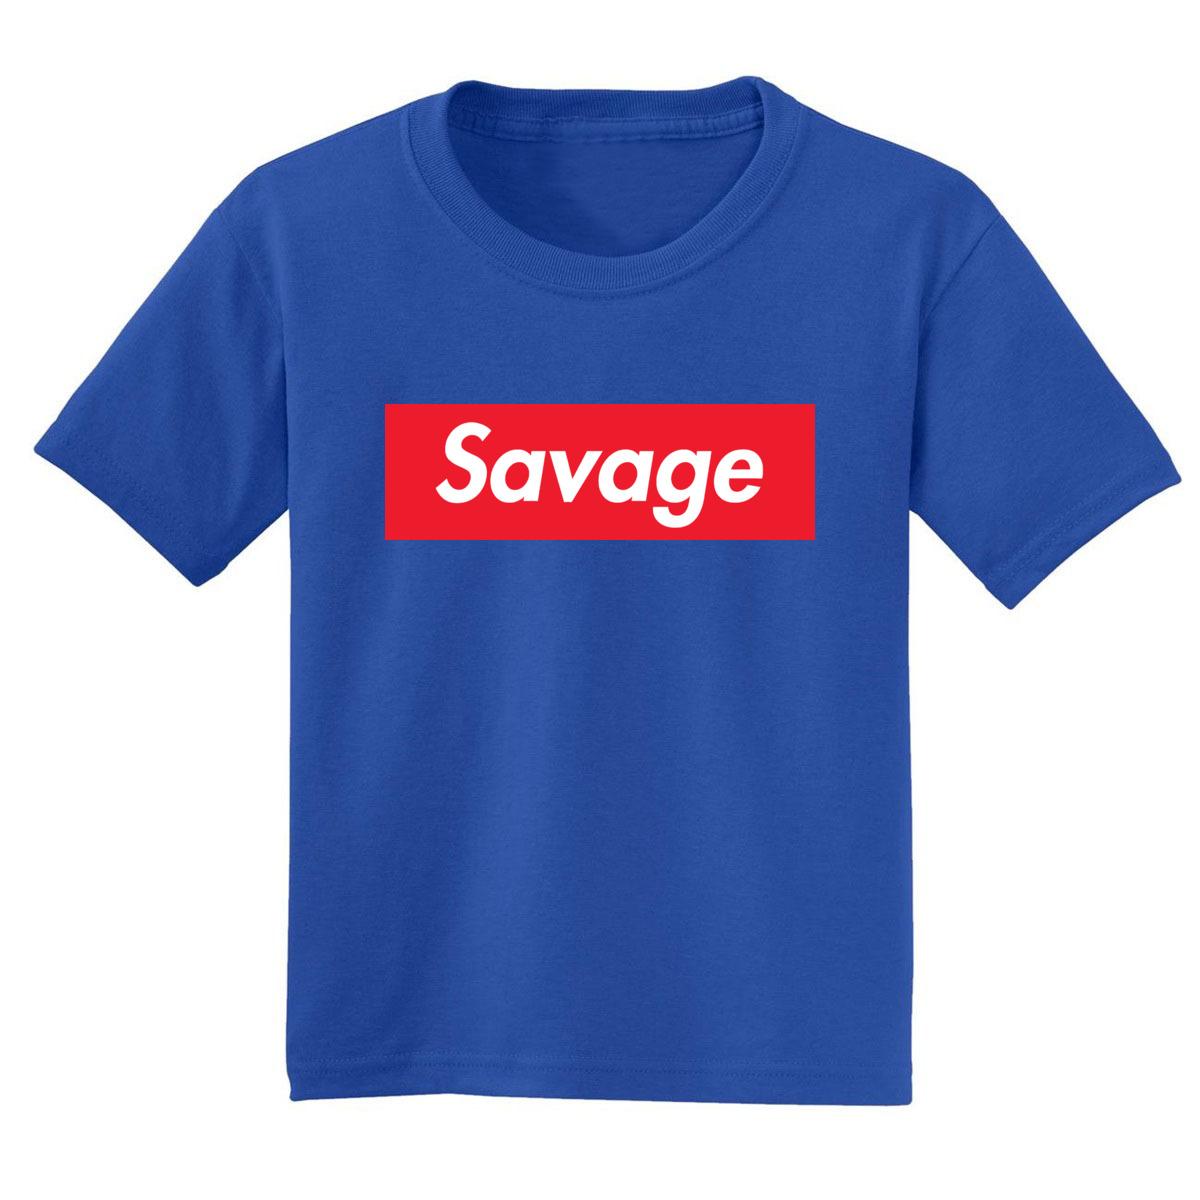 Savage Boys T-Shirt Streetwear Logo Parody Graphic Tee